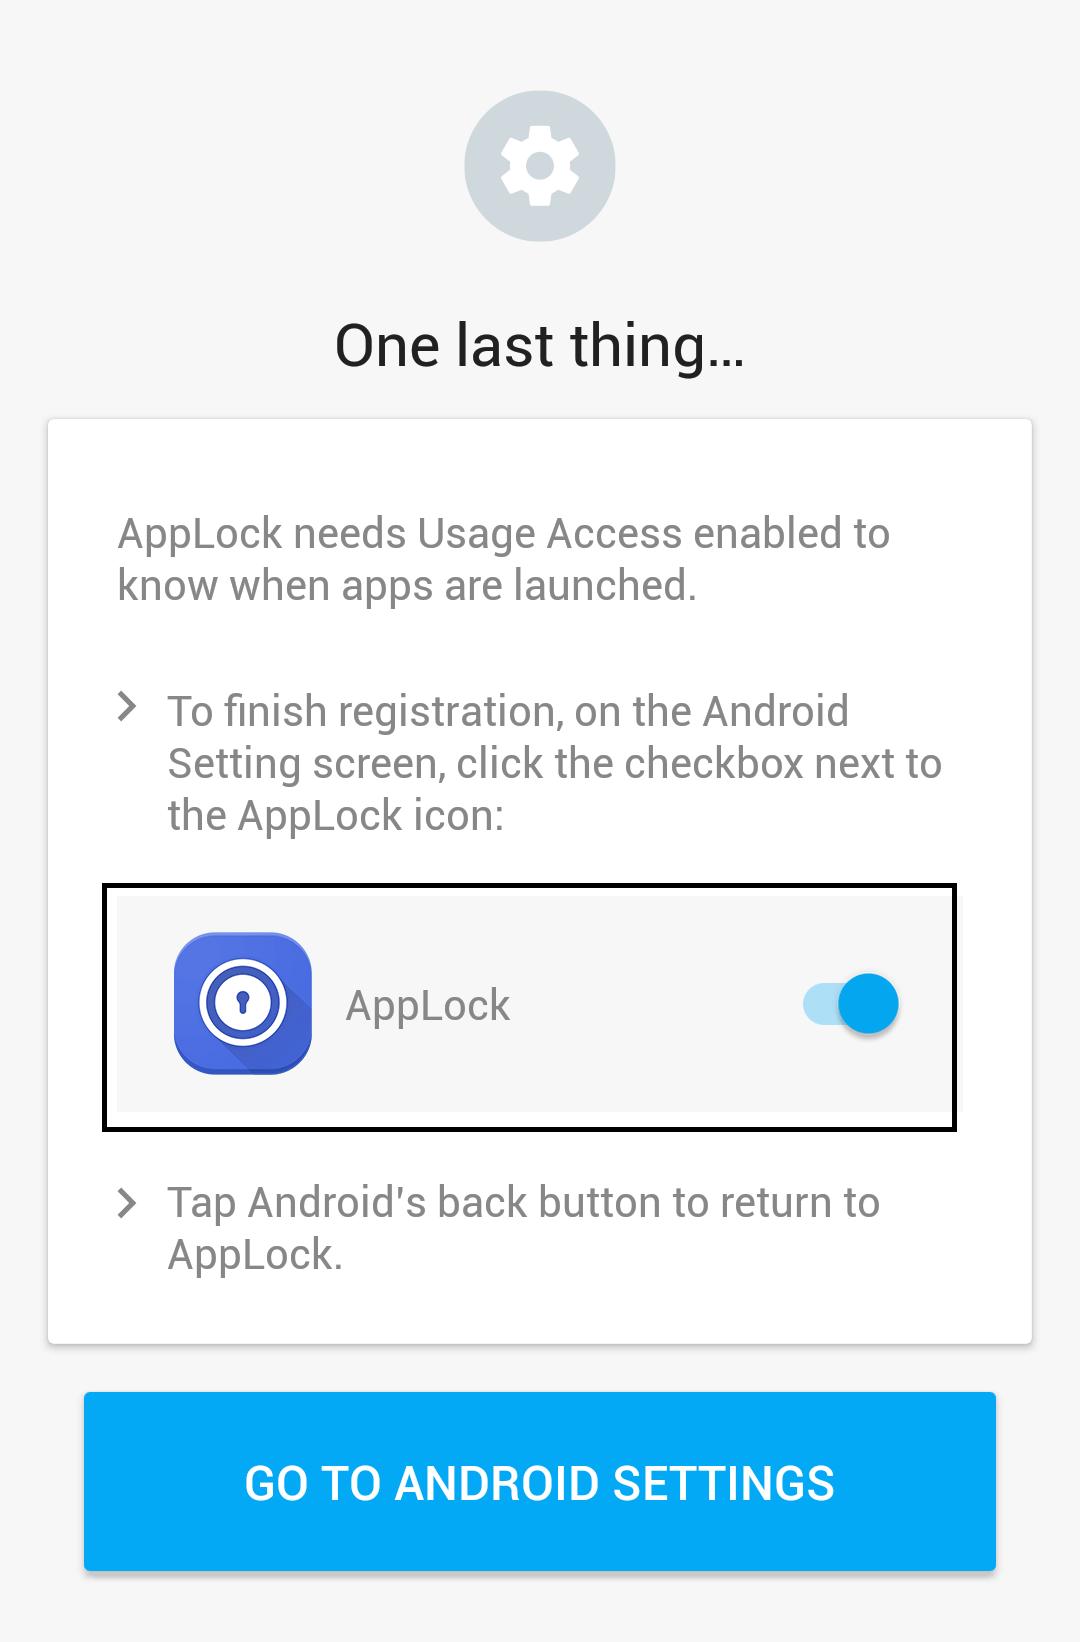 applock access